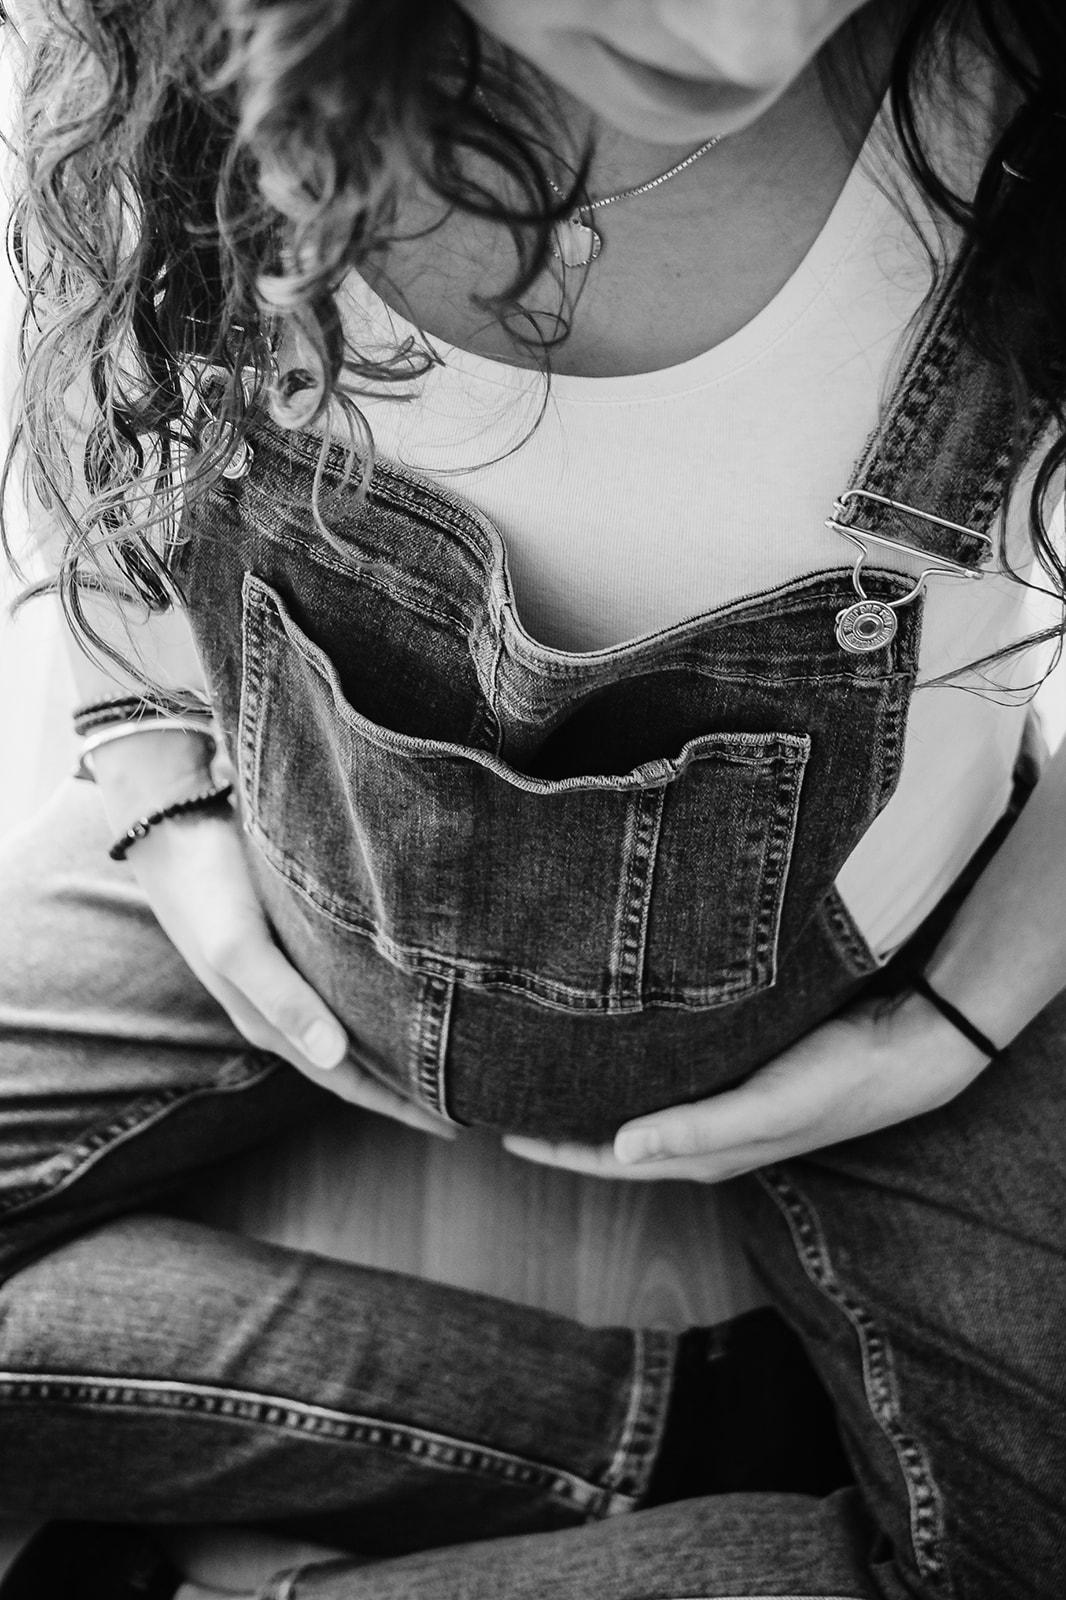 alb, Babyboy, Babyfotograf, Babyfotografie, Babyfotos, Babygirl, baden württemberg, badenwürttemberg, deutschland, Esslingen, Familienfotos, Fotografin, Fotostory, Homestories, Homestory, metzgen, Mutter, newborn, newborn Fotos, newbornfotografie, Nürtingen, Reutlingen, schwäbische alb, schwanger, Schwangerschaft, Schwangerschaftsbilder, Schwangerschaftsfotografie, Schwangerschaftsfotos, Sohn, Stuttgart, Tochter, Tübingen, Vater, Zuhause